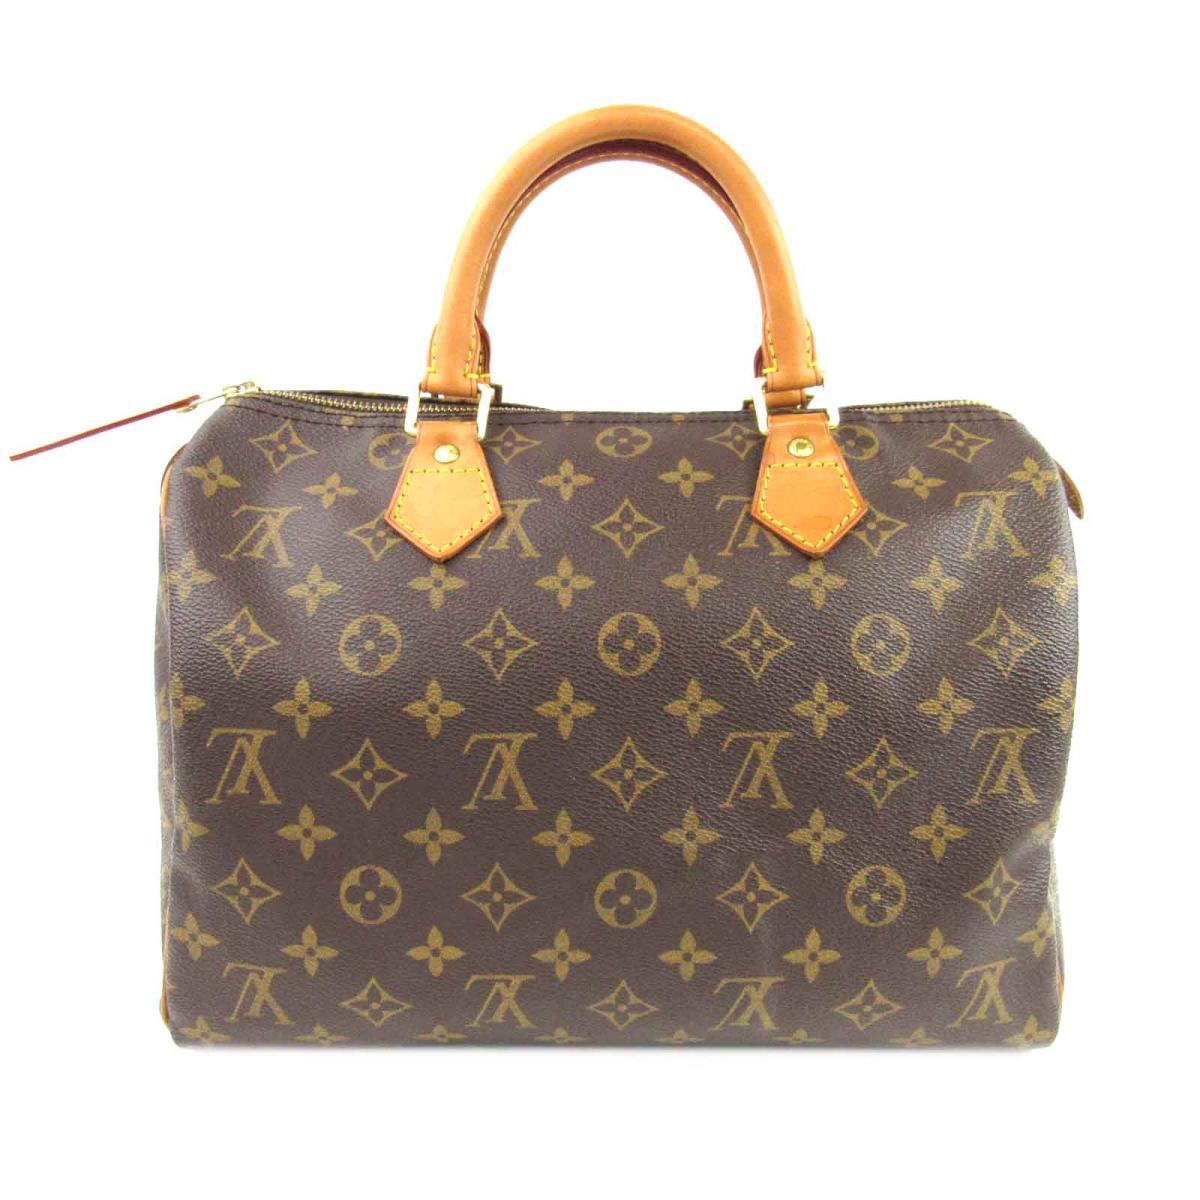 05bbf2807113 (Free shipping) Auth LOUIS VUITTON Speedy 30 Hand bag M41526 Monogram Used